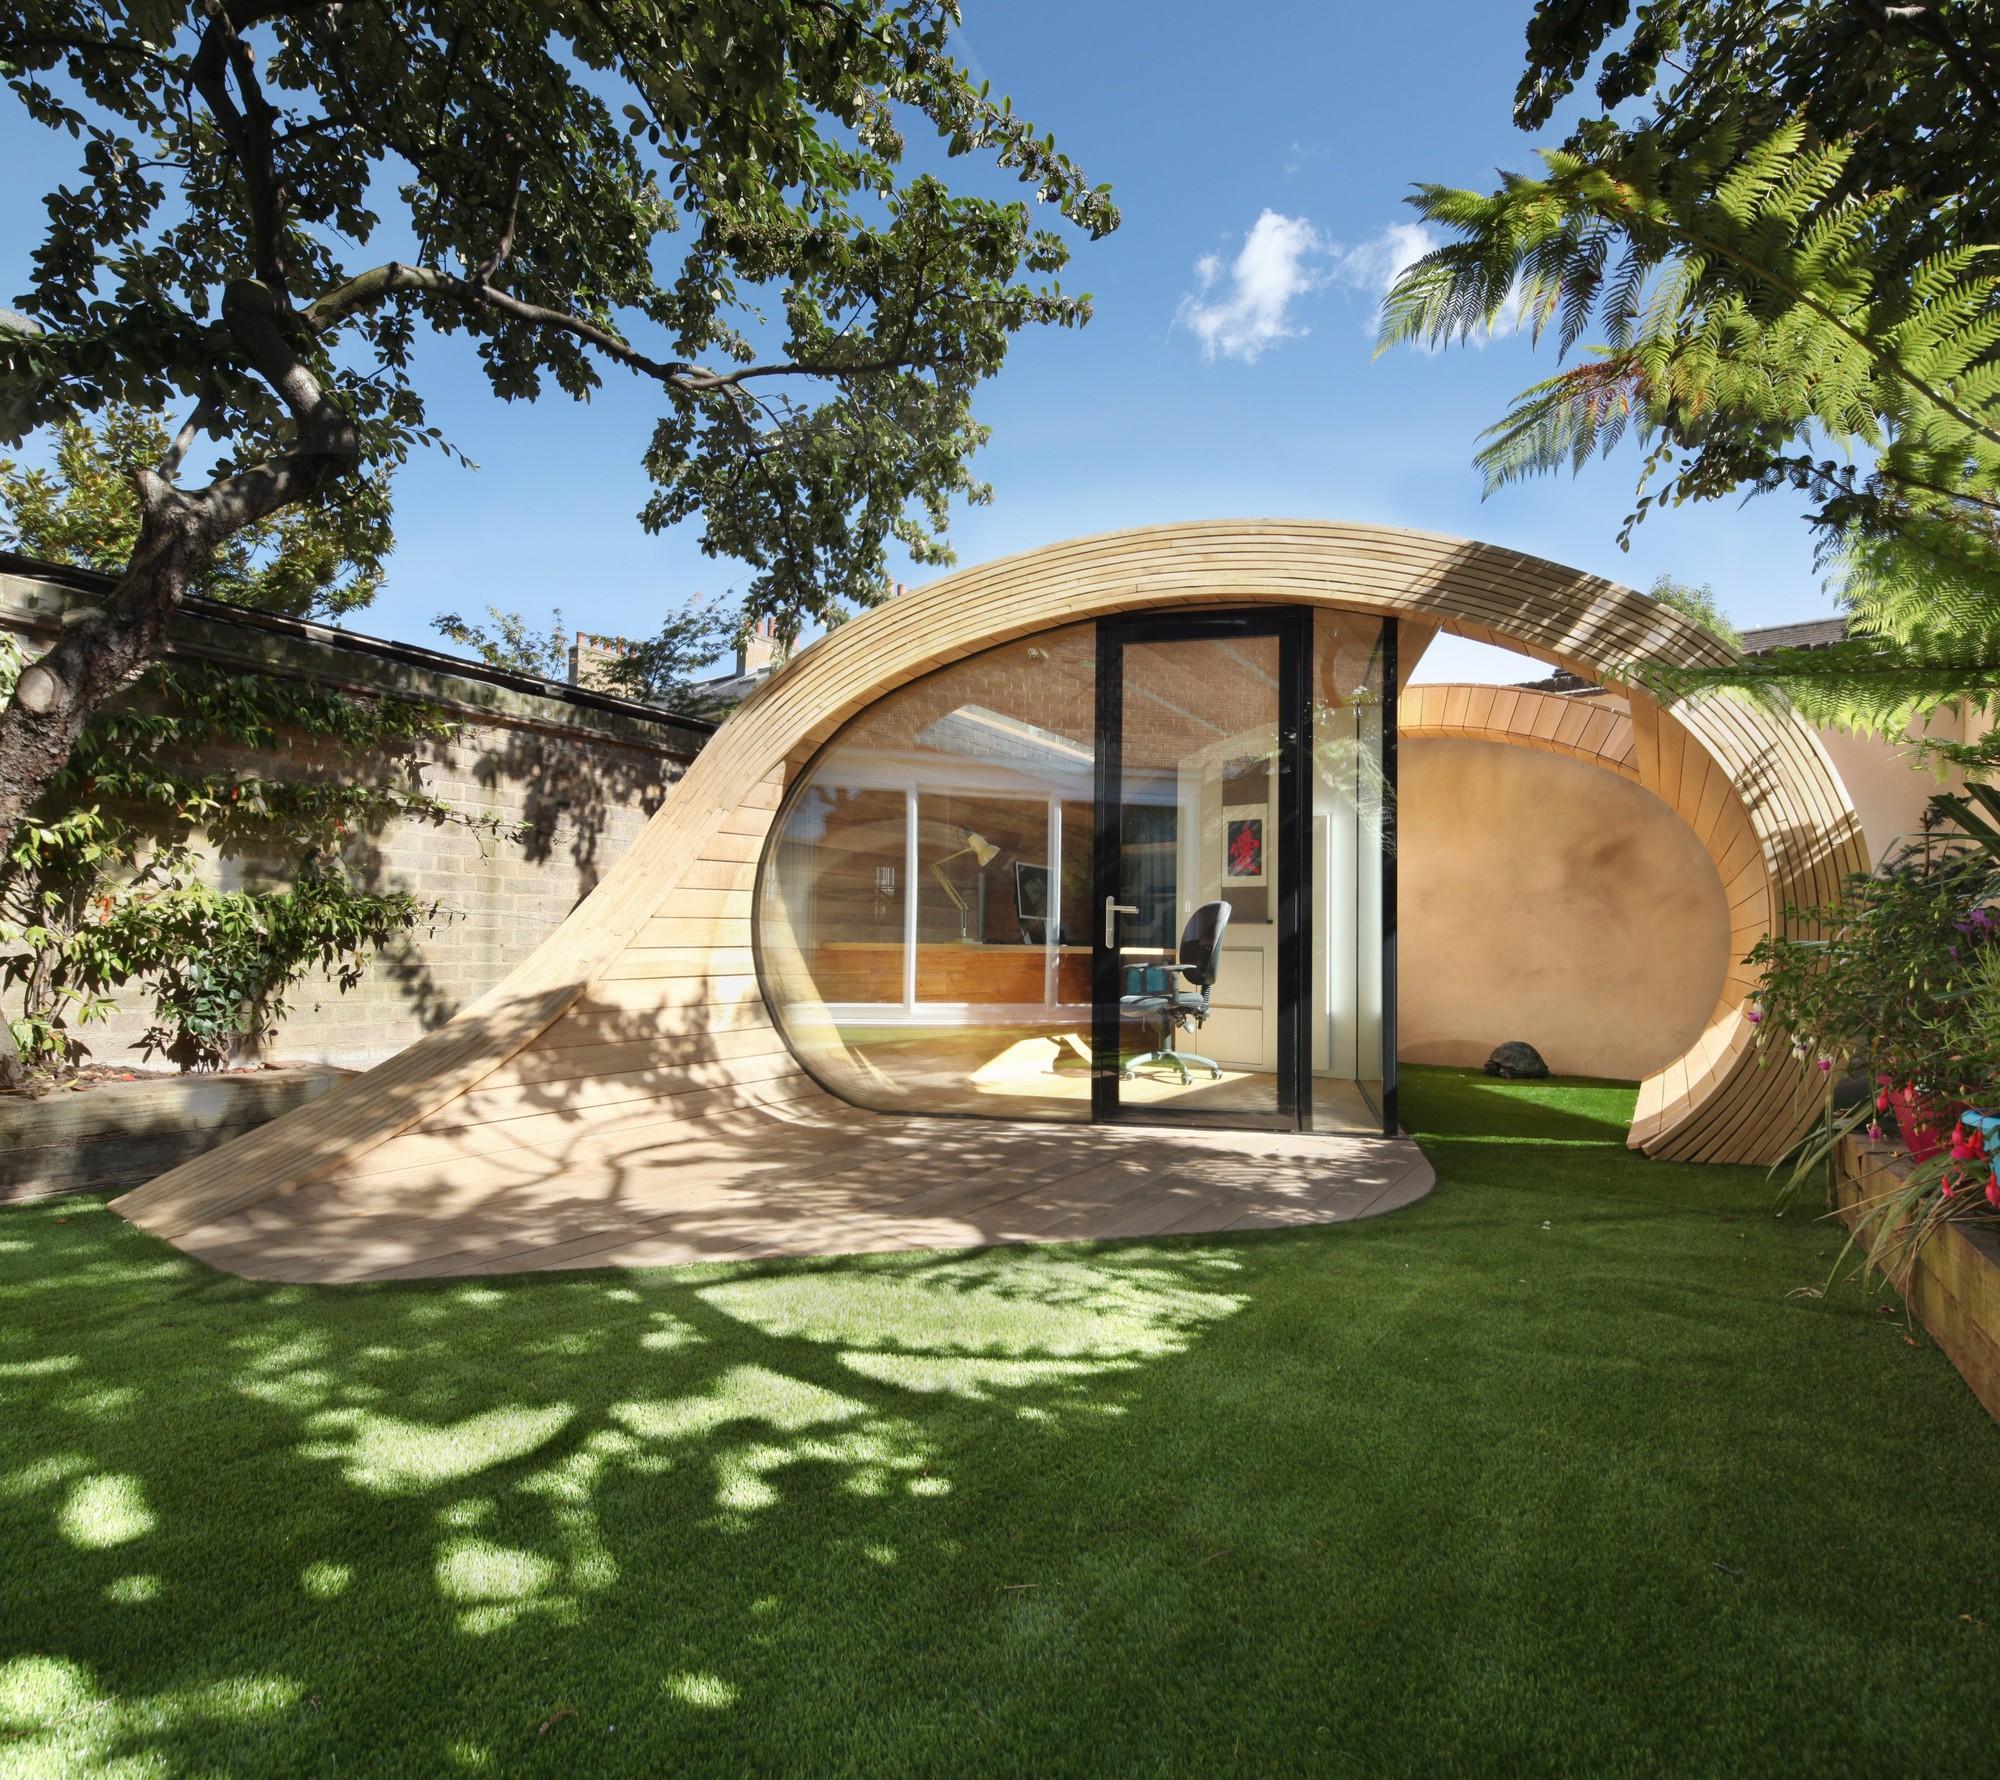 Shoffice / Platform 5 Architects